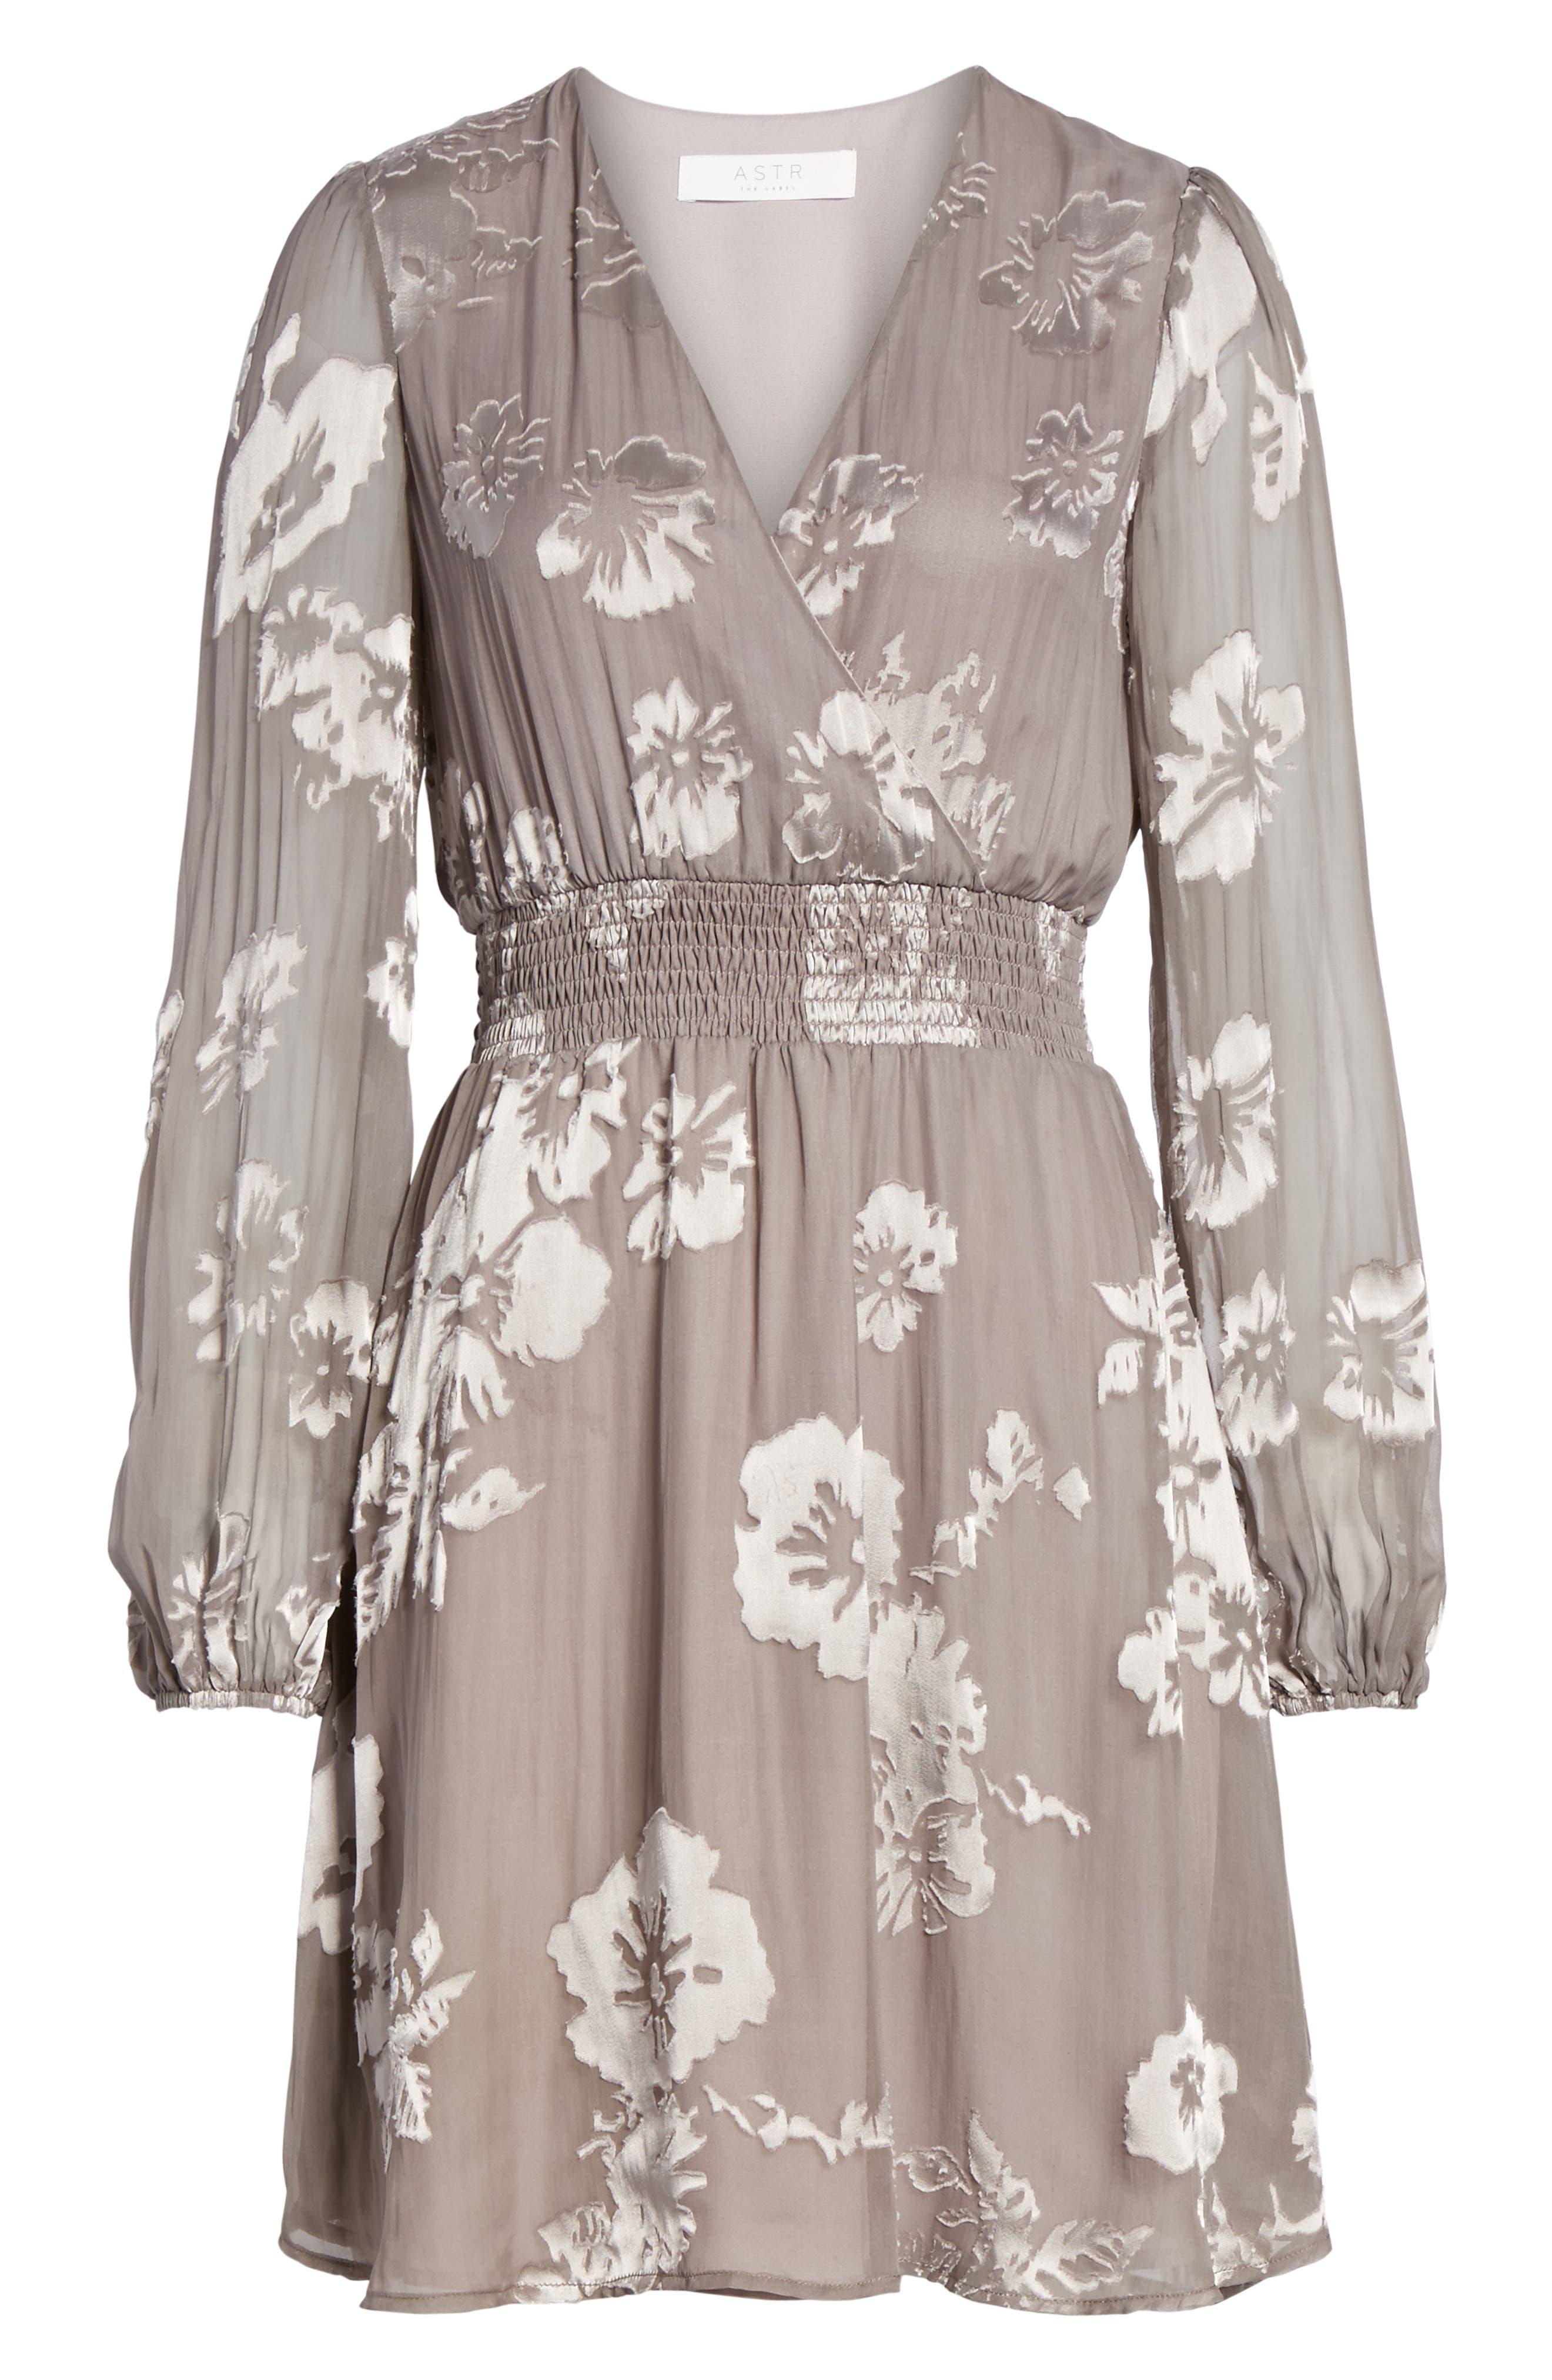 Mabeline Fit & Flare Dress,                             Alternate thumbnail 6, color,                             500